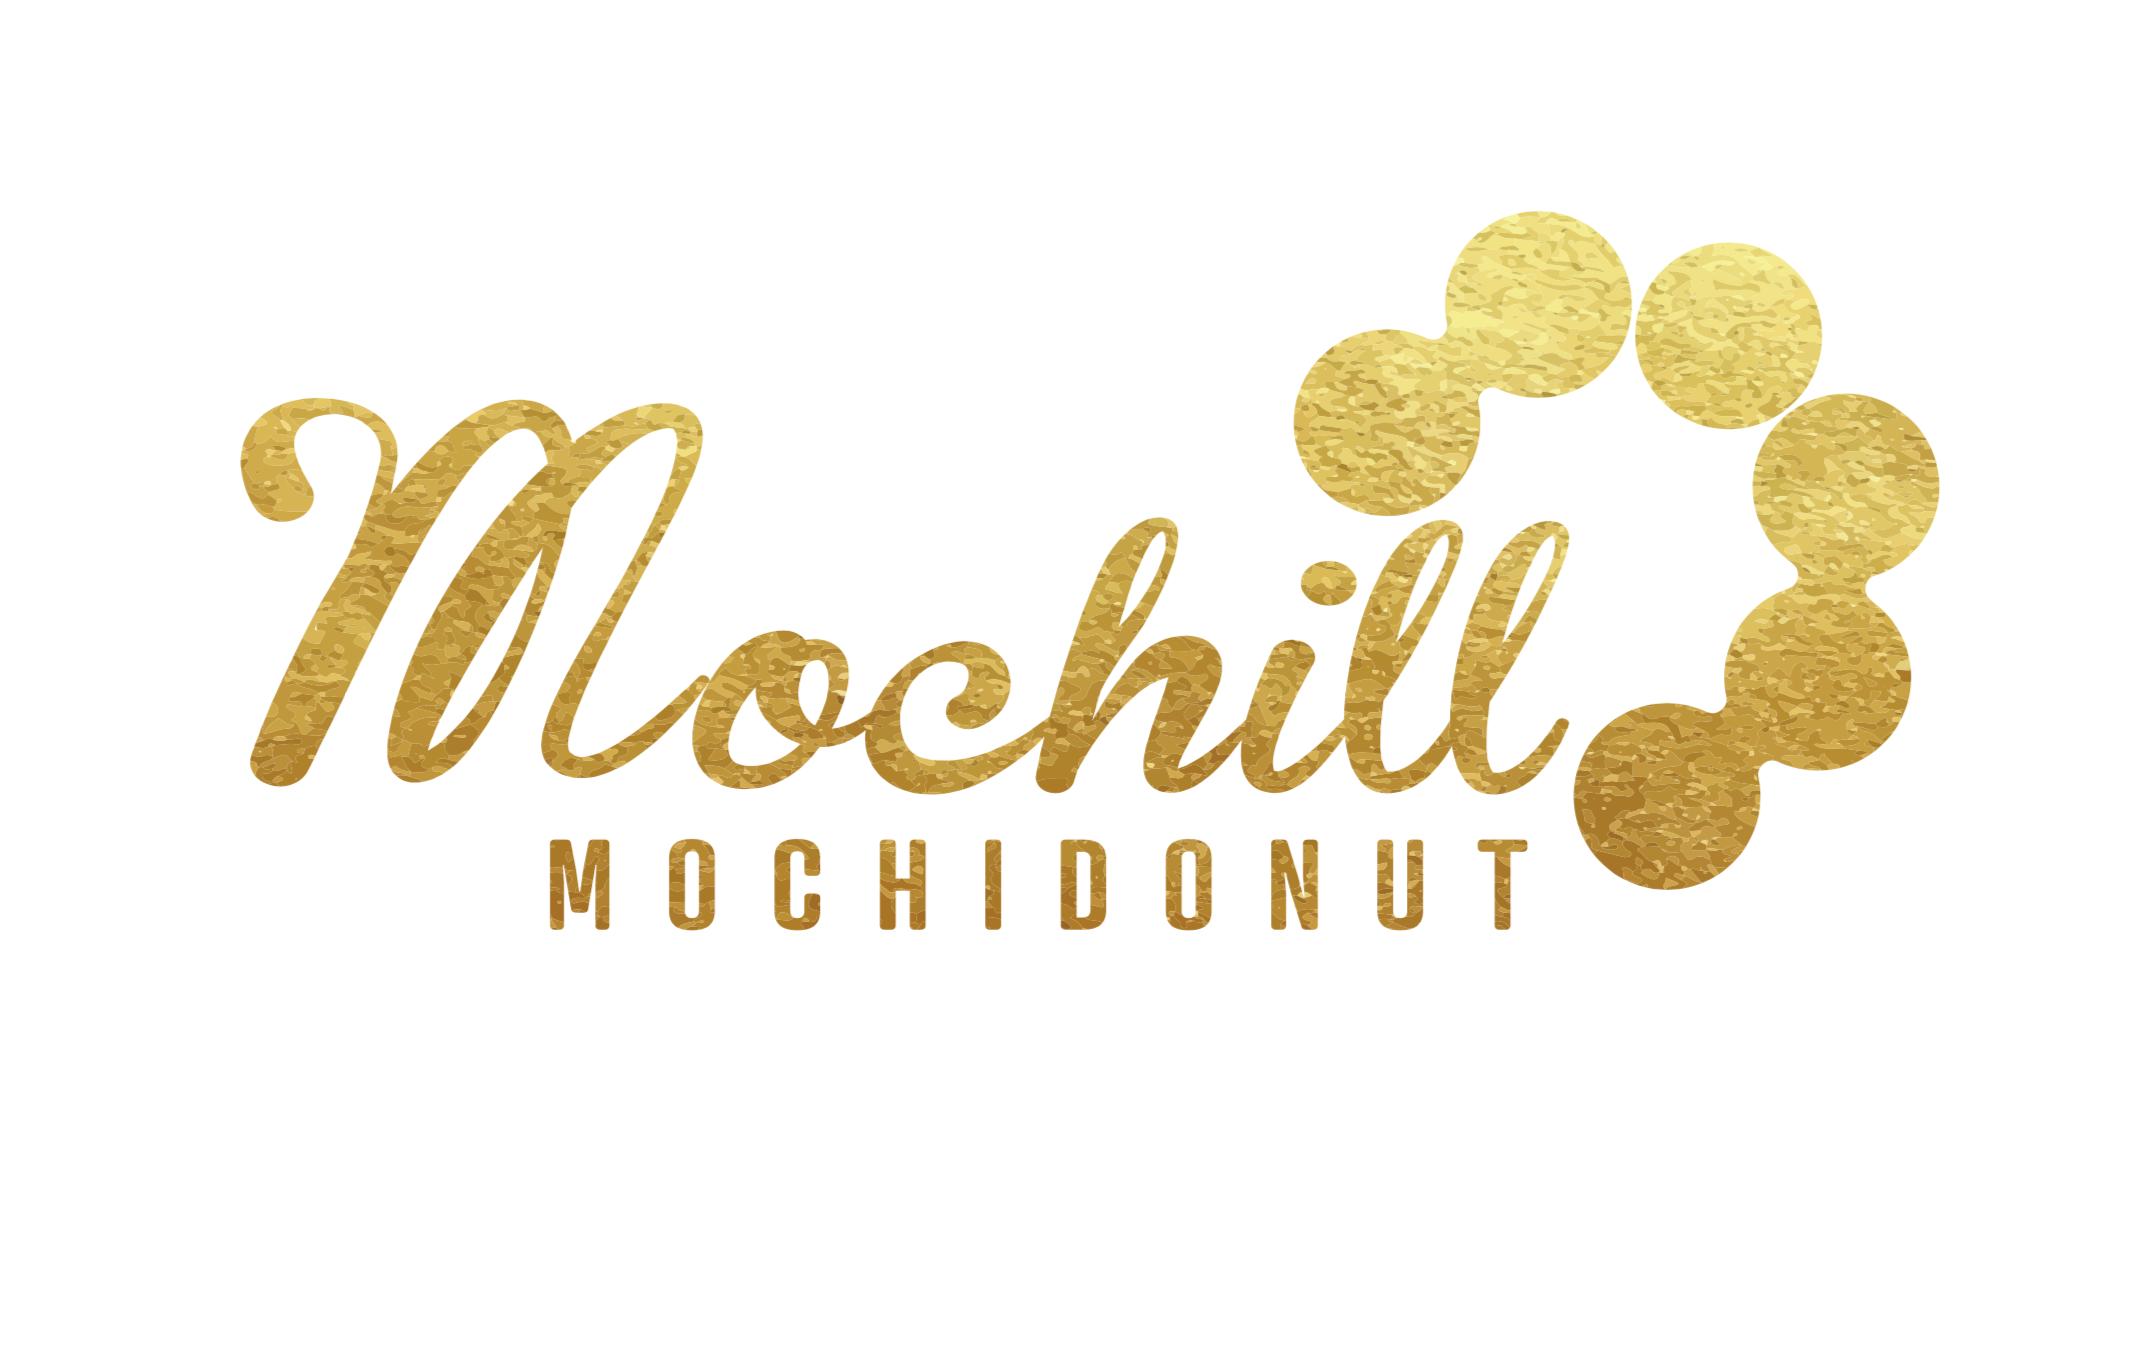 Mochill Mochi Donut Logo